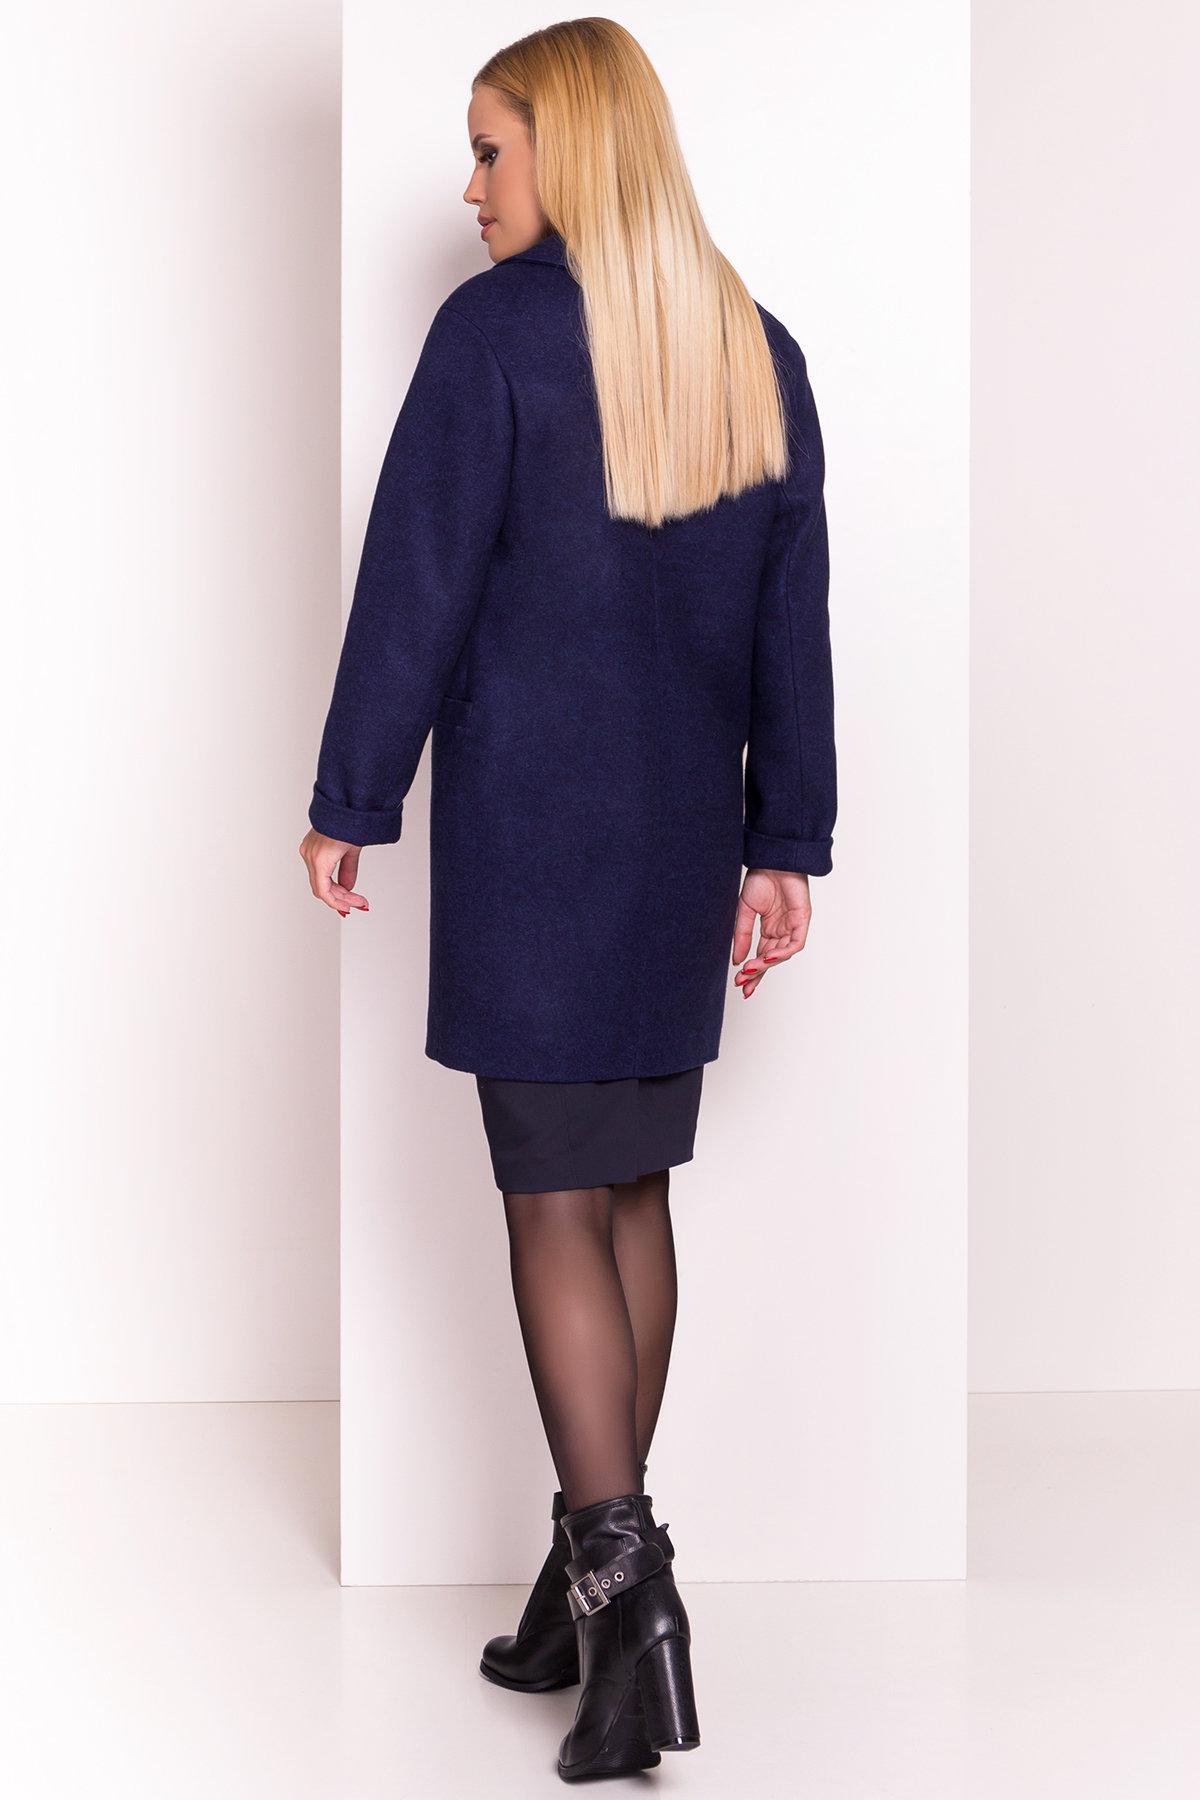 Демисезонное пальто Вива 4558 АРТ. 37261 Цвет: Темно-синий 17 - фото 4, интернет магазин tm-modus.ru